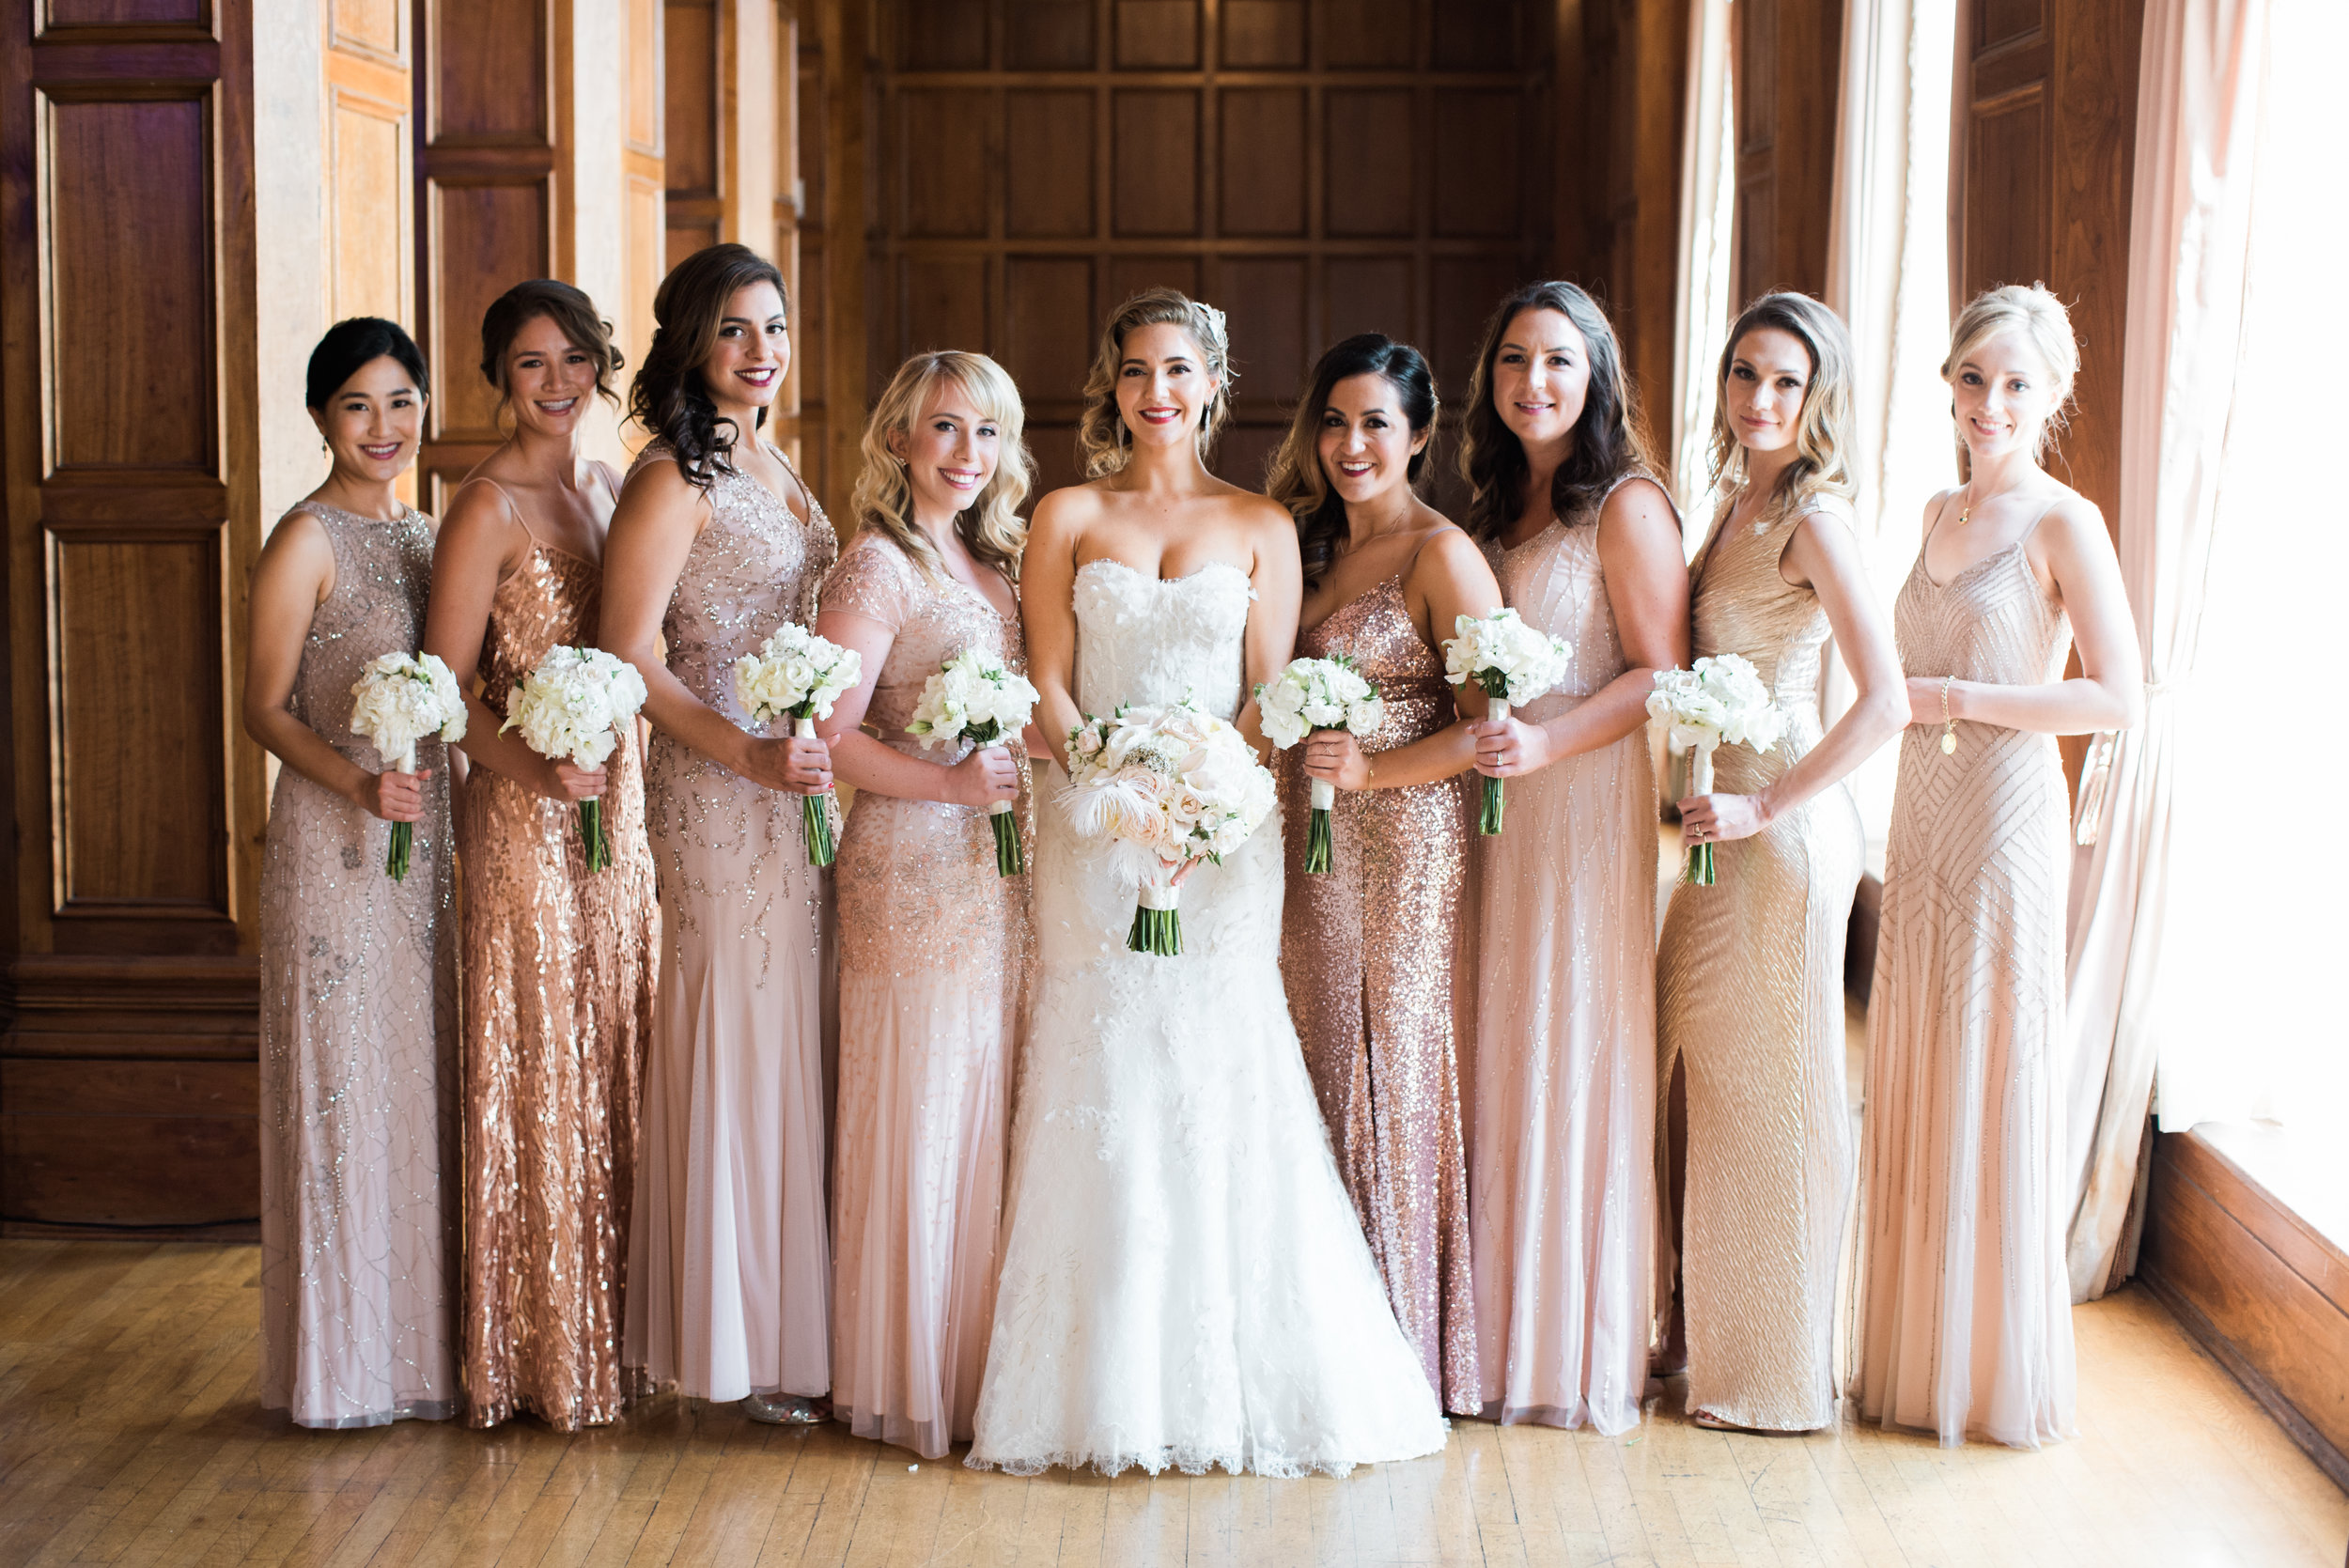 wedding_photographer_greg_ross-005.jpg